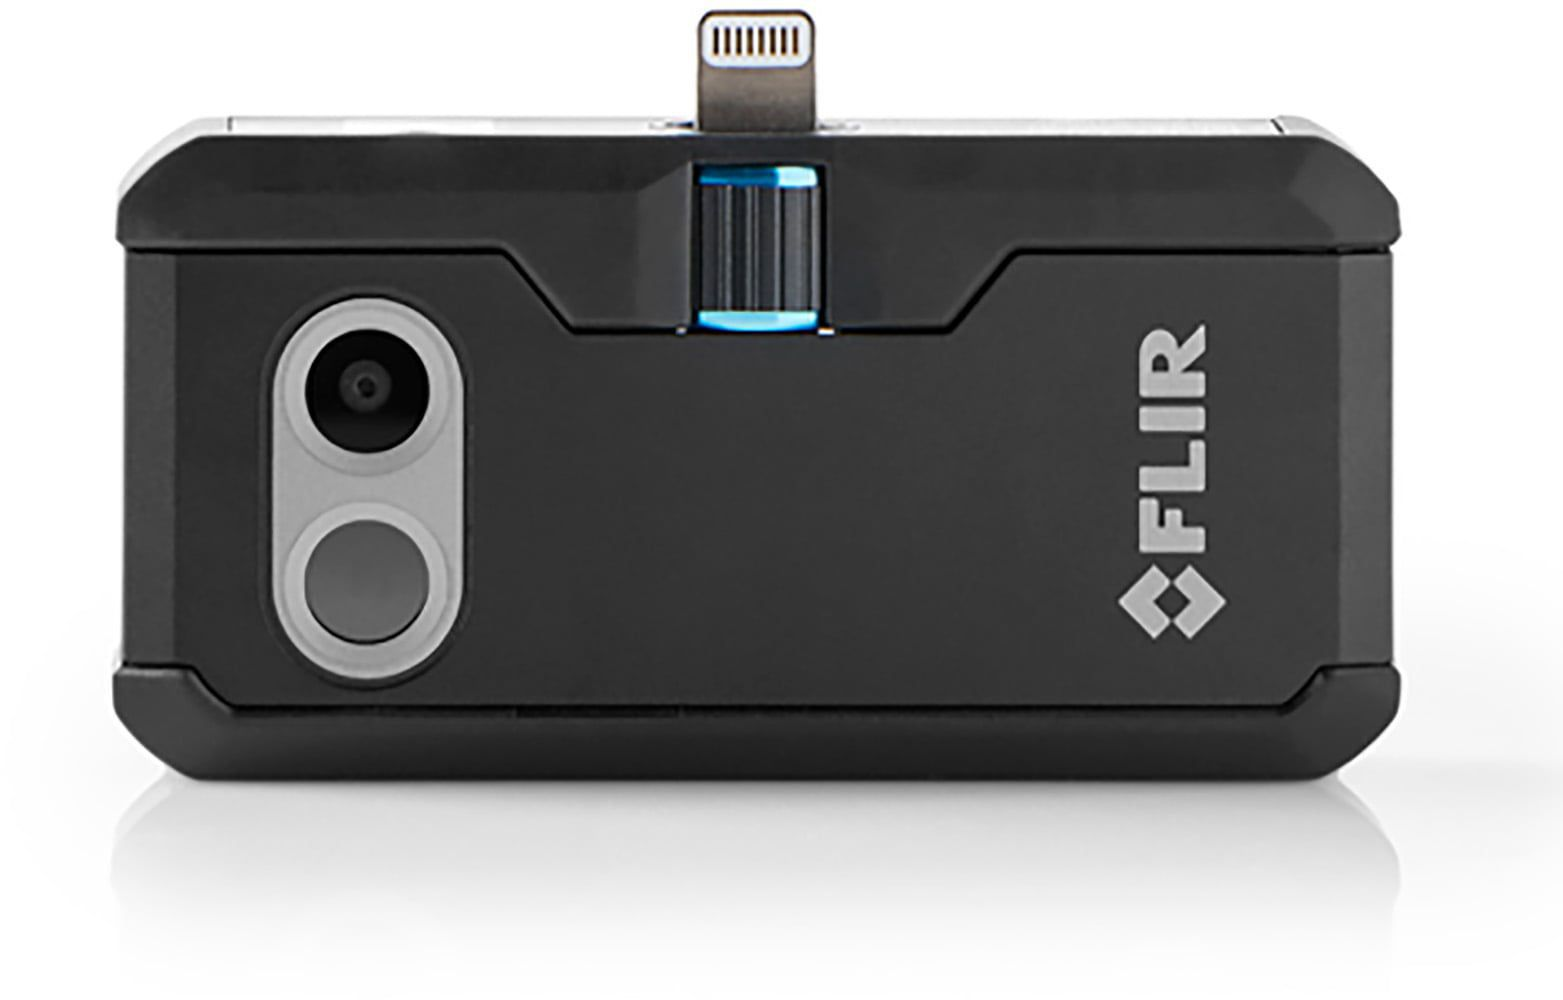 Câmera Termográfica para Celular 4.800 PIXELS (-20 °C A 120 °C) Flir One PRO LT IOS  - MRE Ferramentas